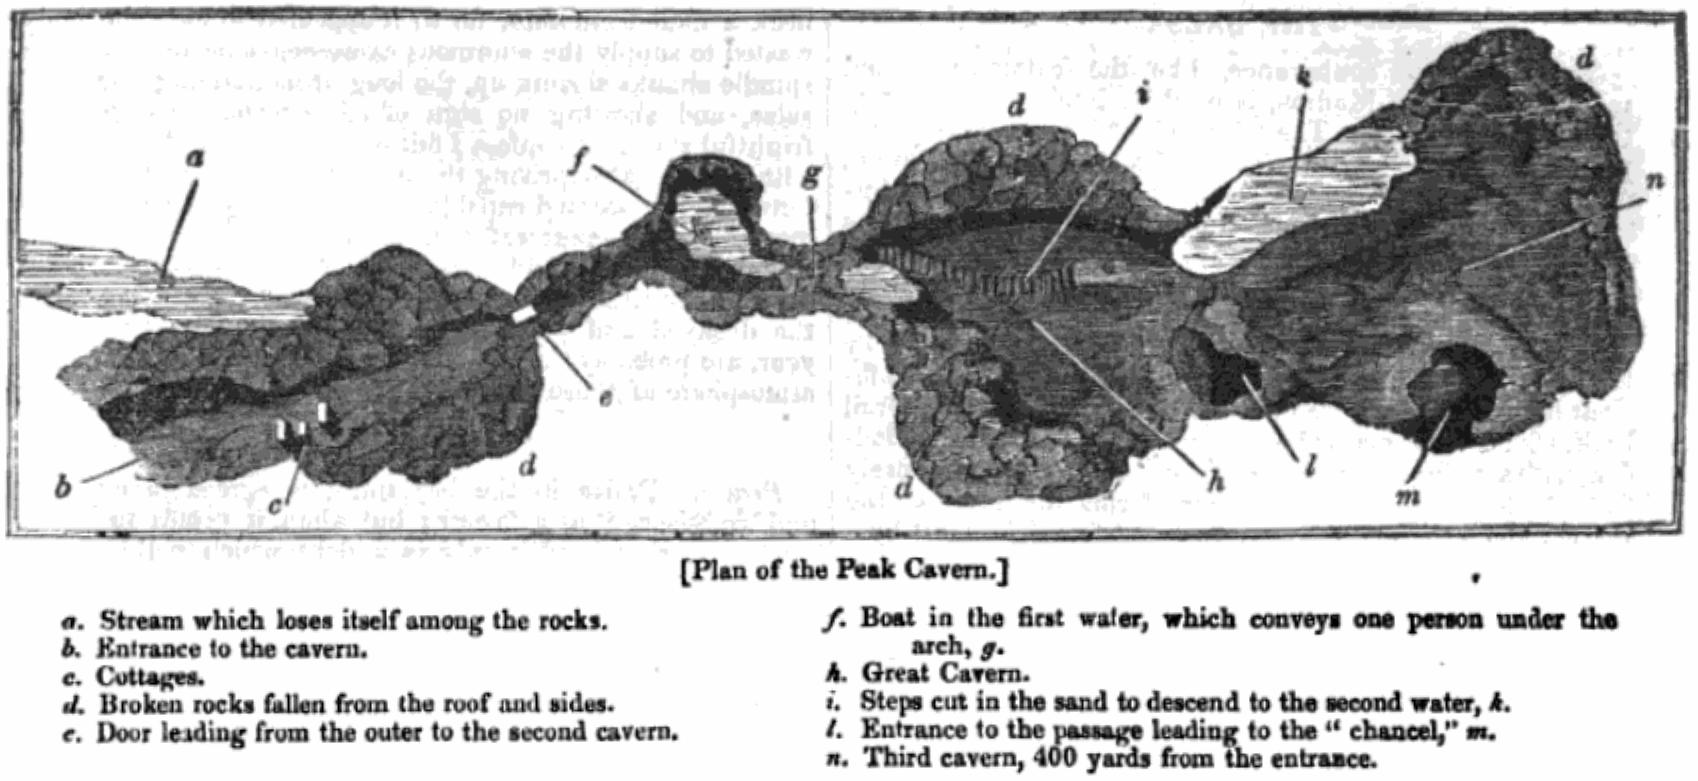 Plan of Peak Cavern